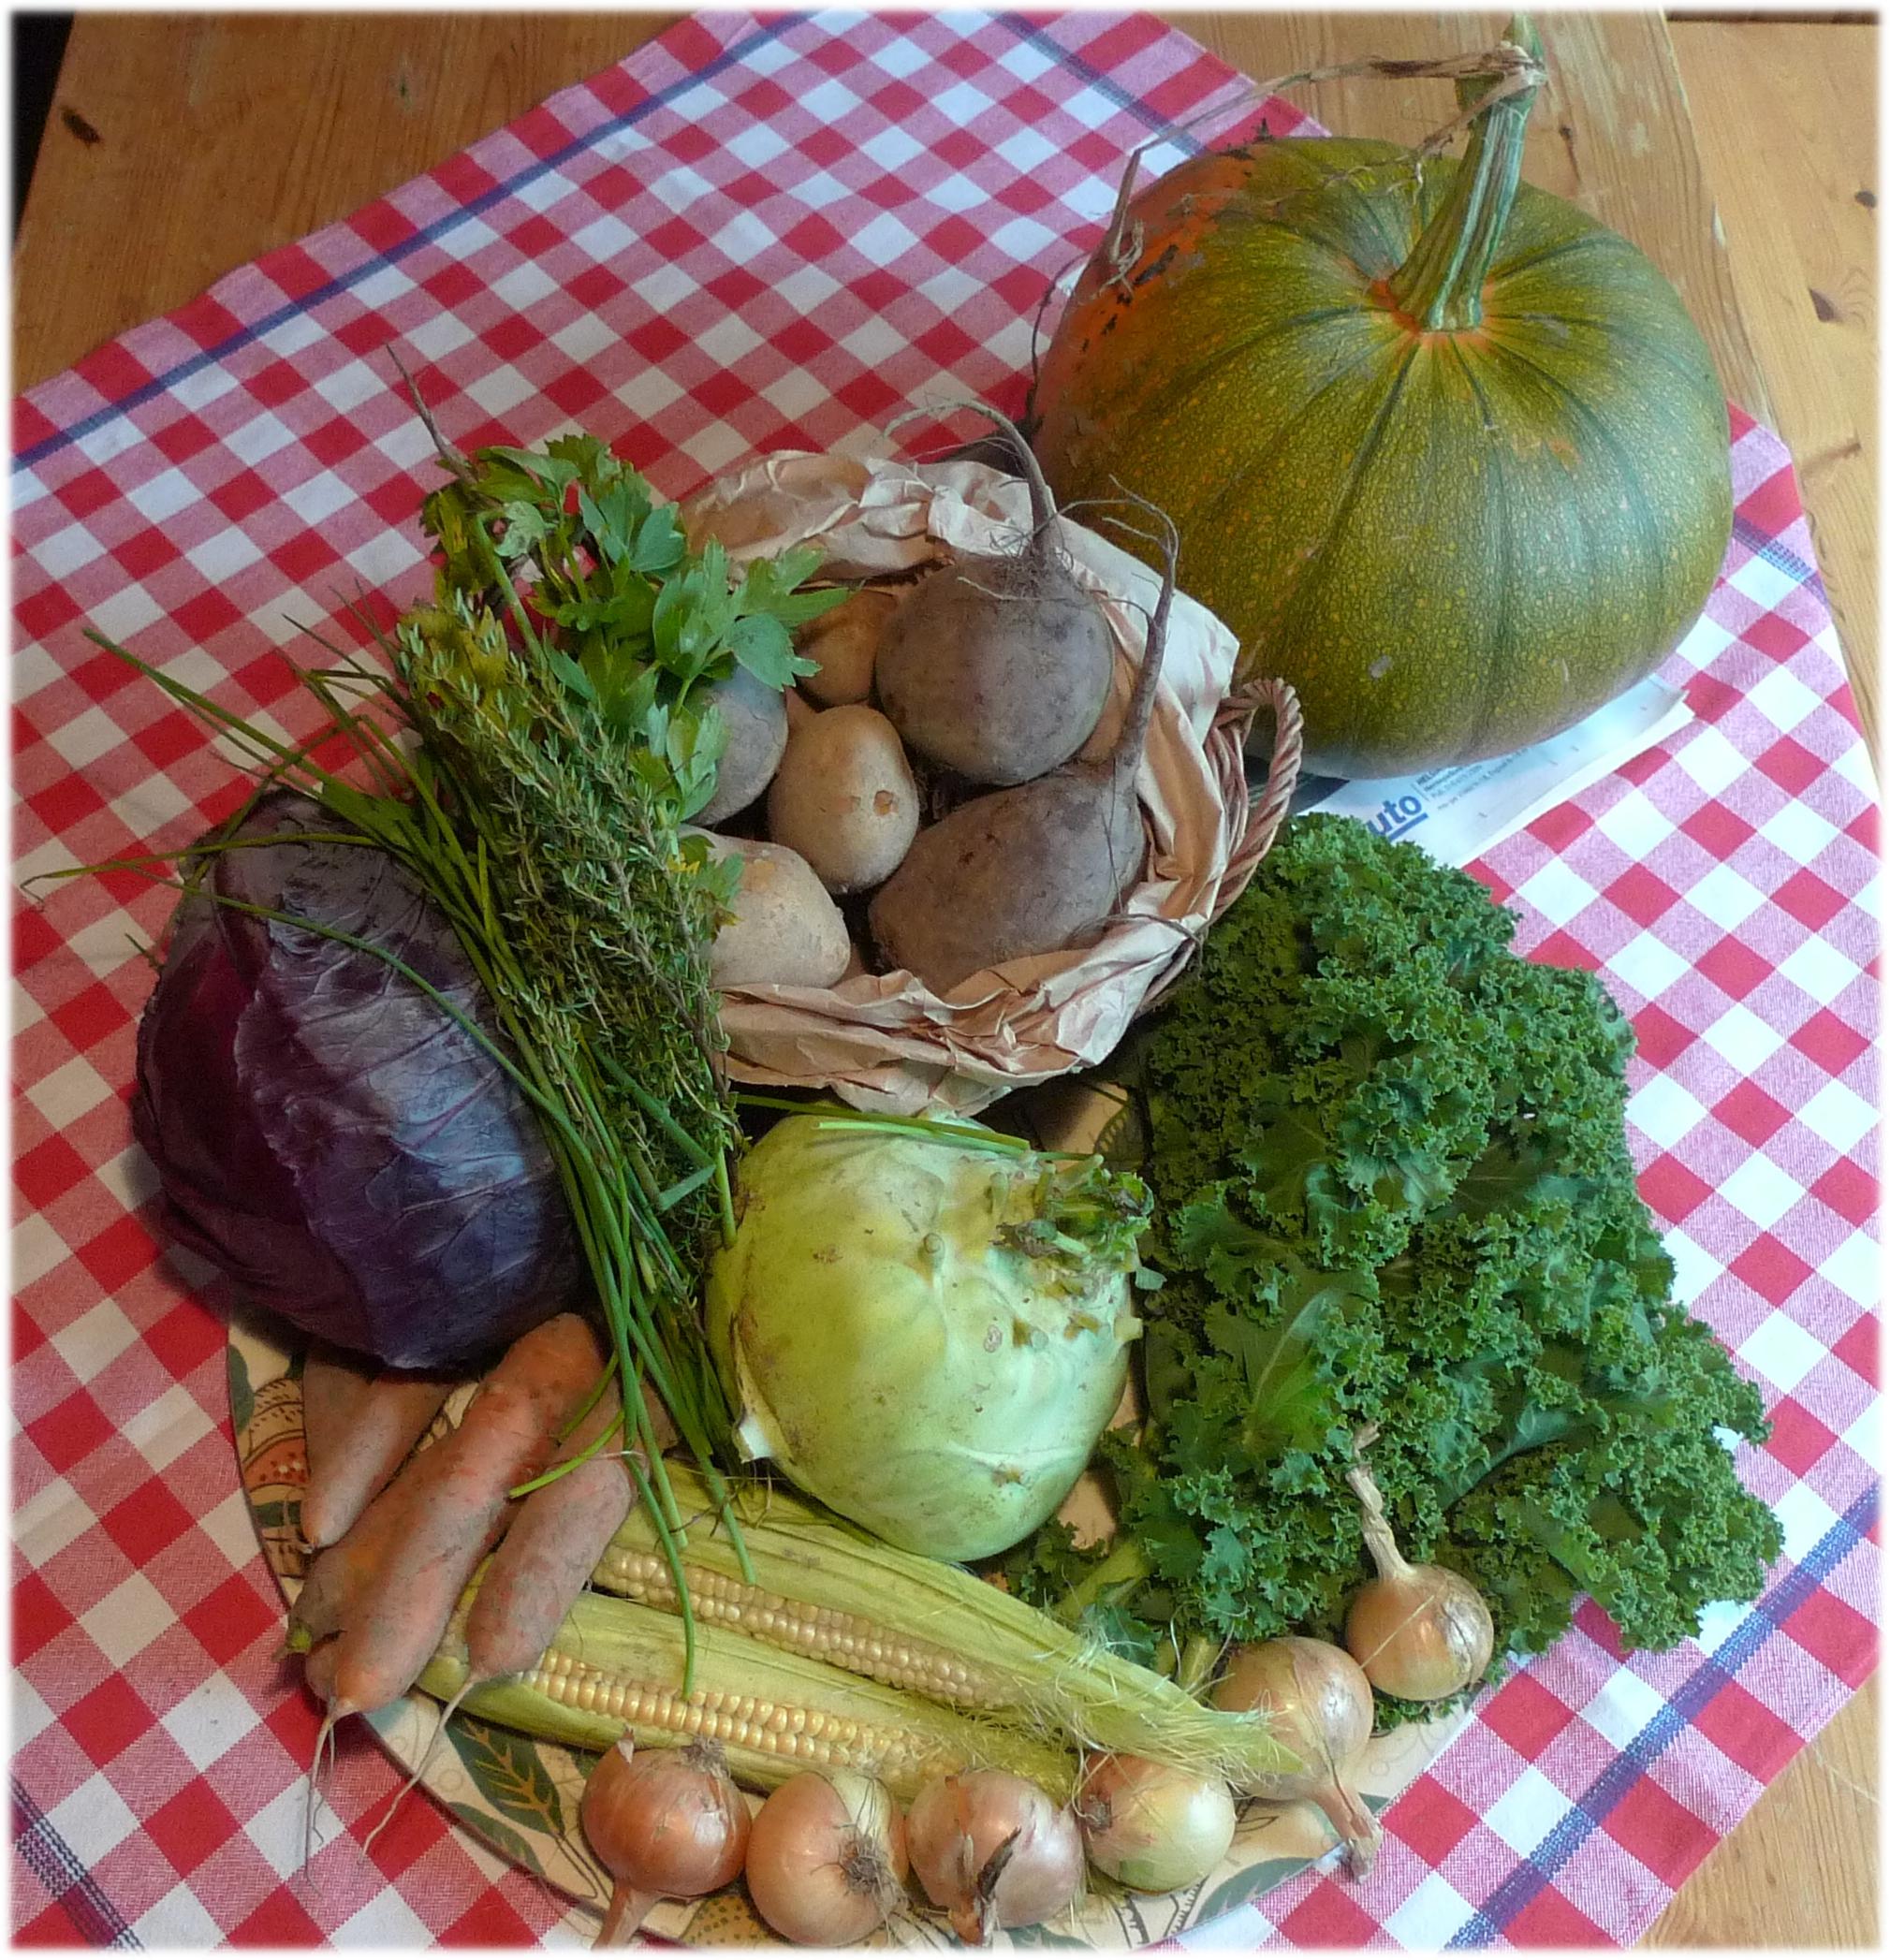 17.9.2013: kurpitsa 4740 g, punakaali 1855 g, porkkana 322 g, maissi, 343 g, kyssäkaali 1340 g, sipuli 334 g, lehtikaali 200 g, punajuuri 713 g, peruna 2300 g ja yrttinippu.